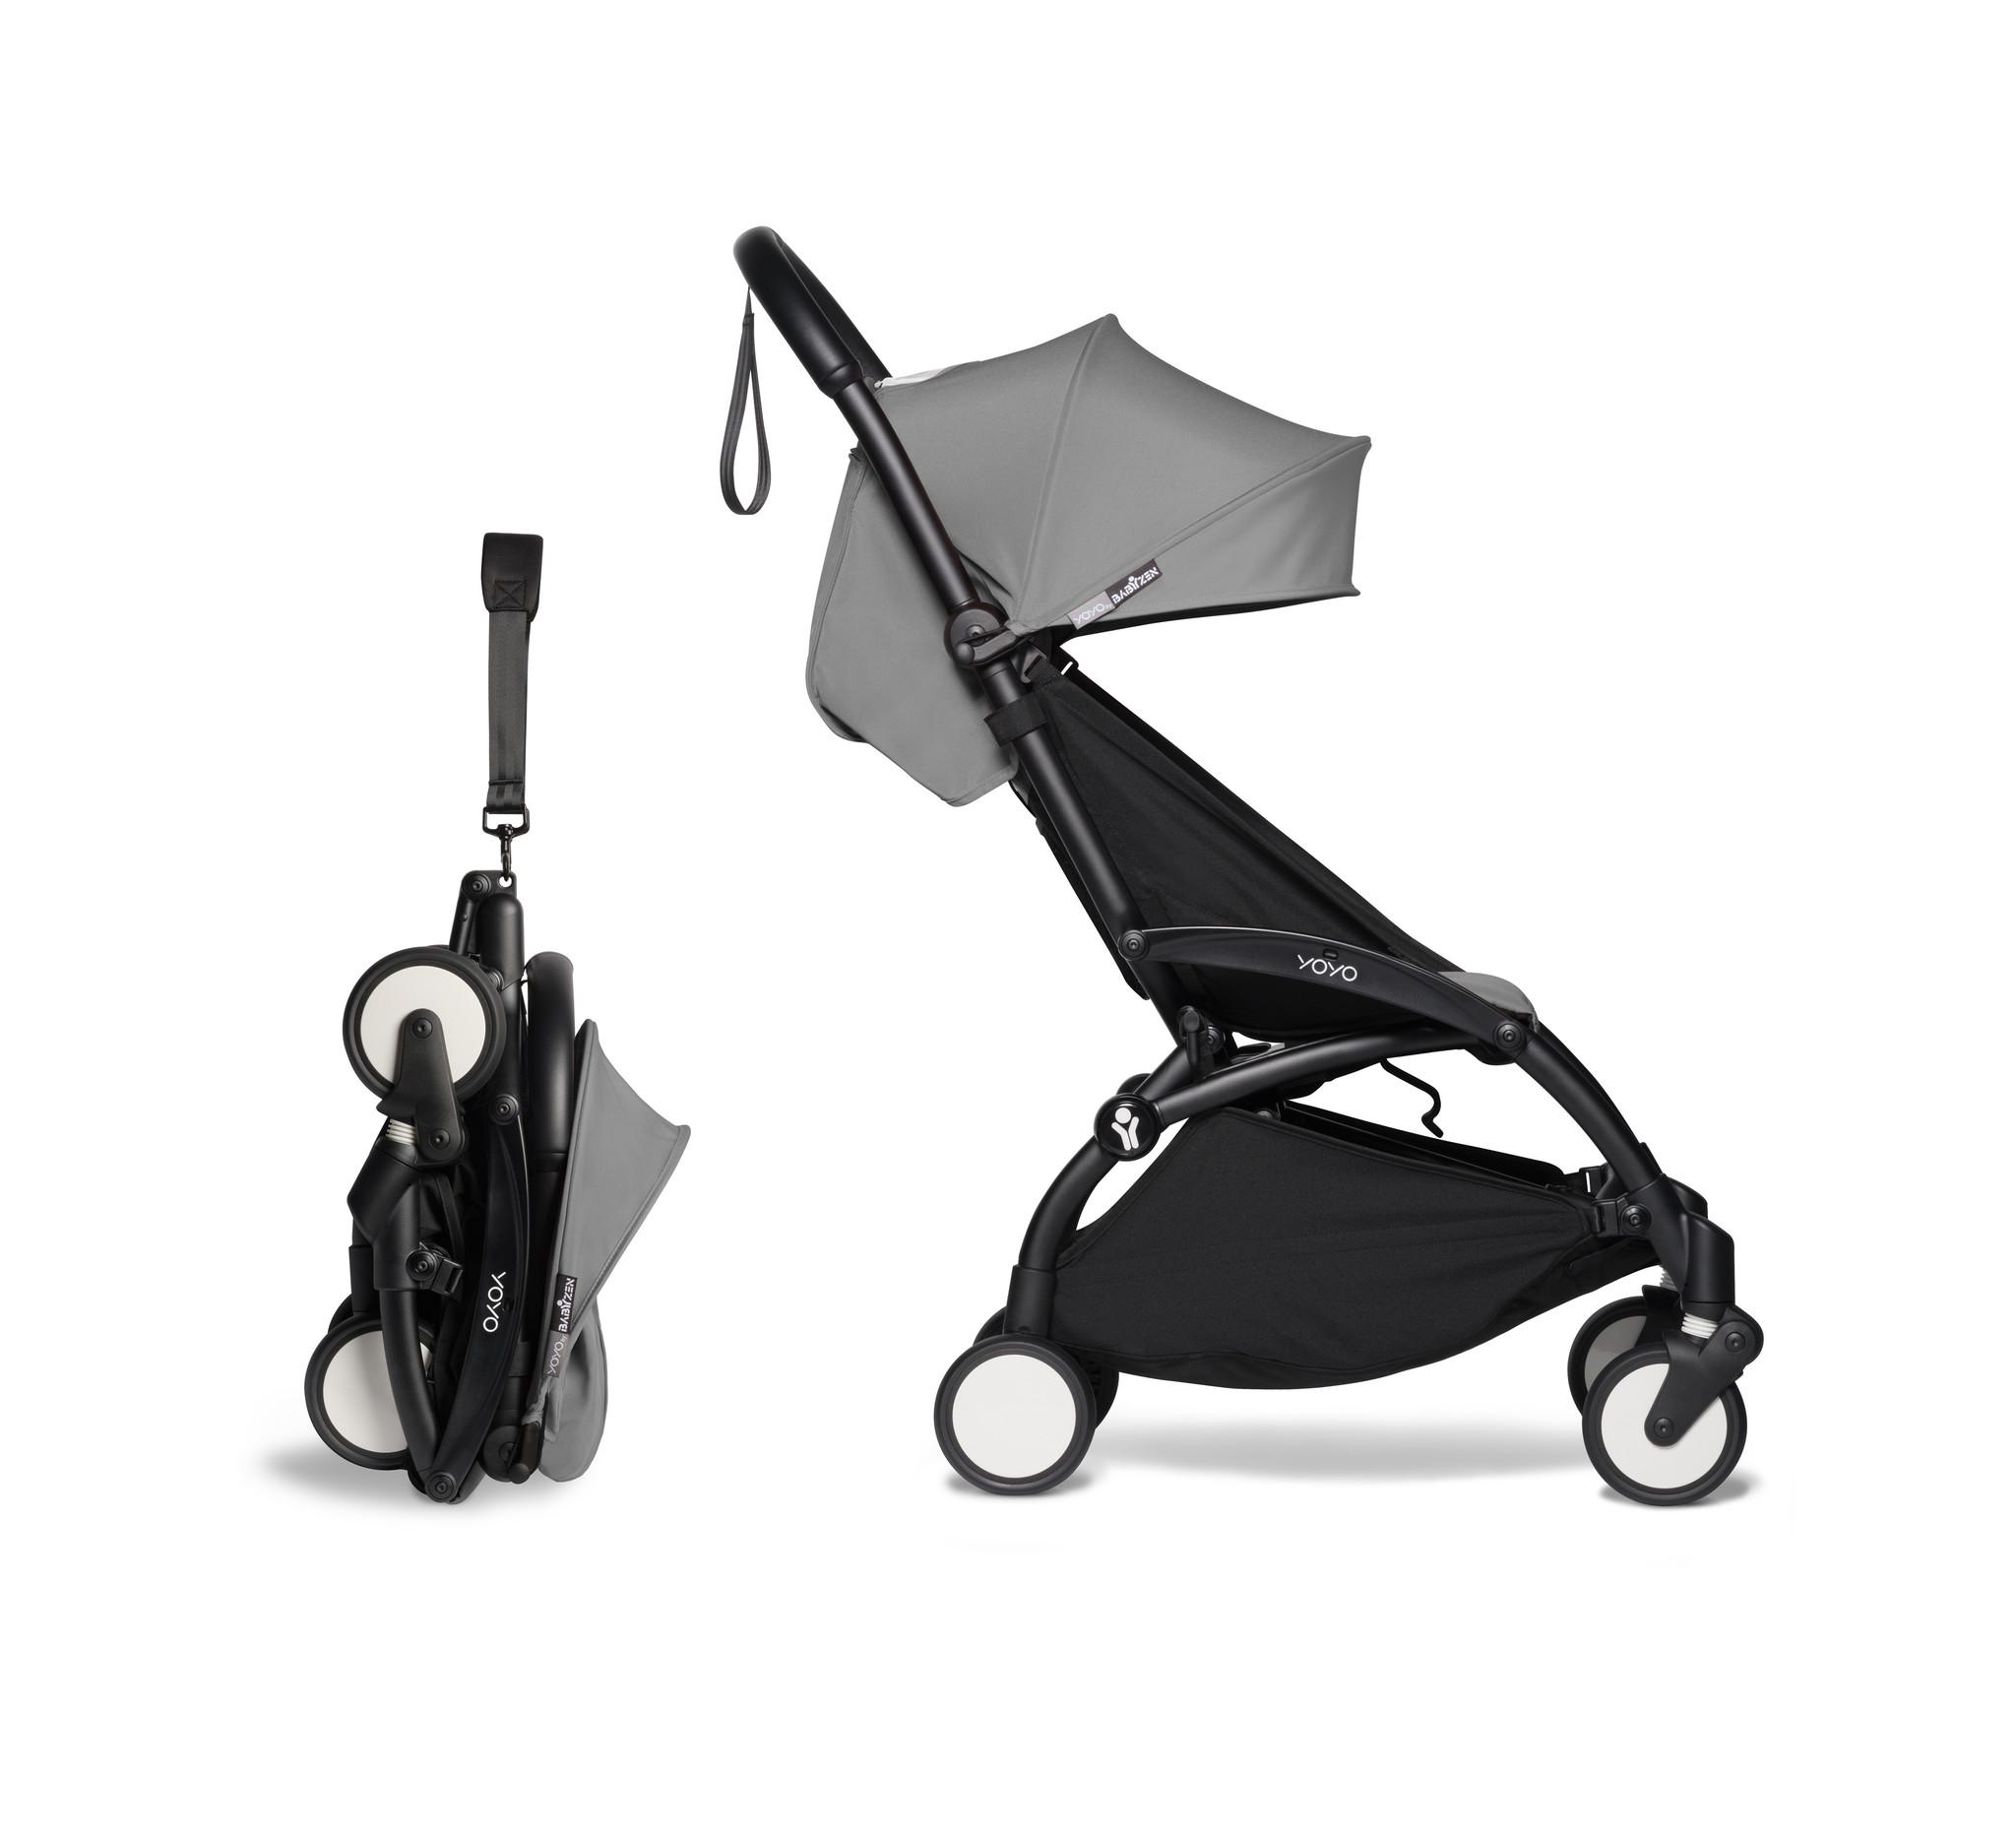 Babyzen Babyzen YOYO² Buggy 6+ grauer Rahmen schwarz